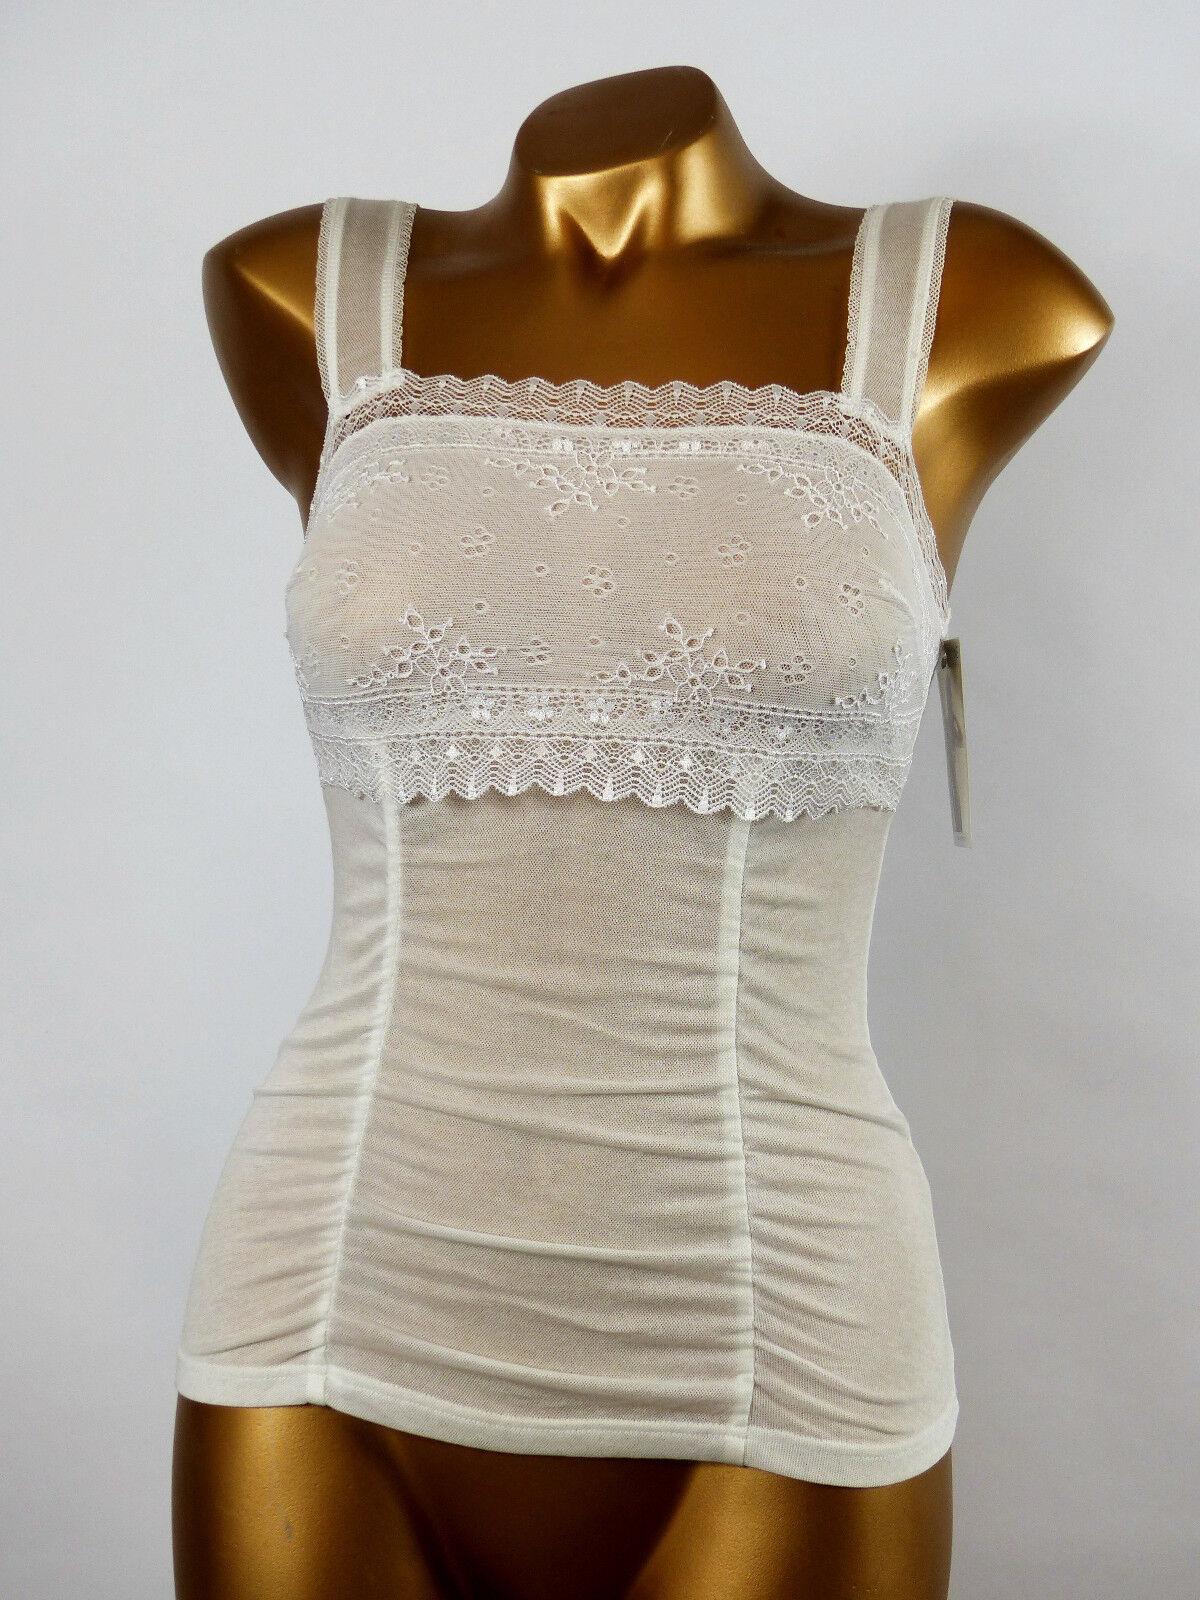 ARIANNE - size S - Haut Caraco Tulle Dentelle 5743, coloris   white